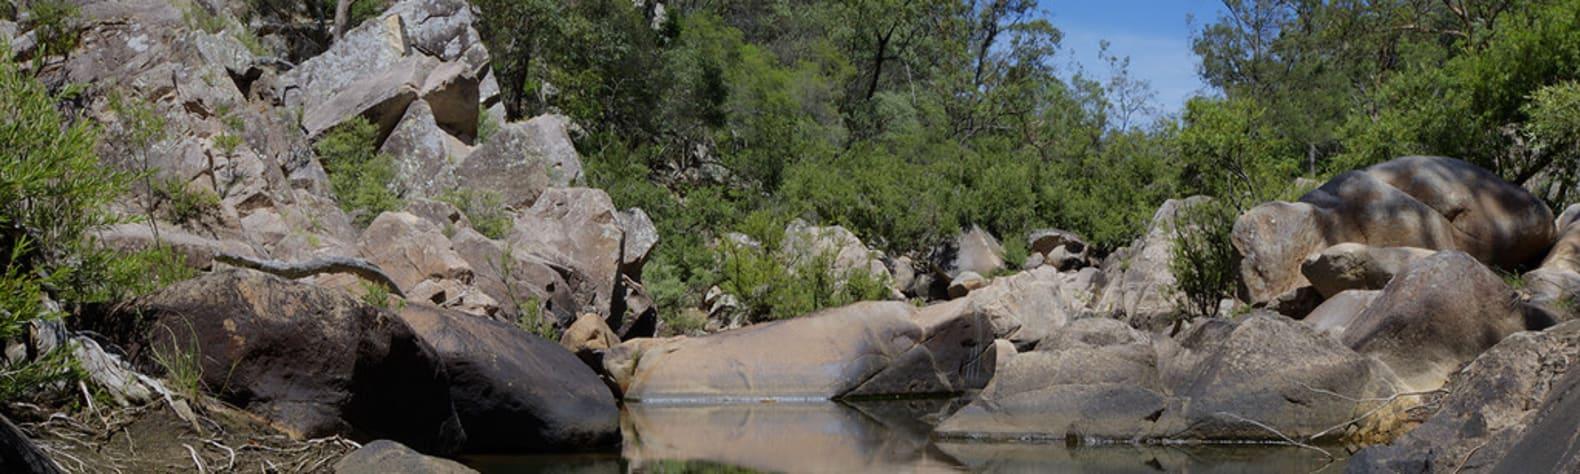 Crows Nest National Park